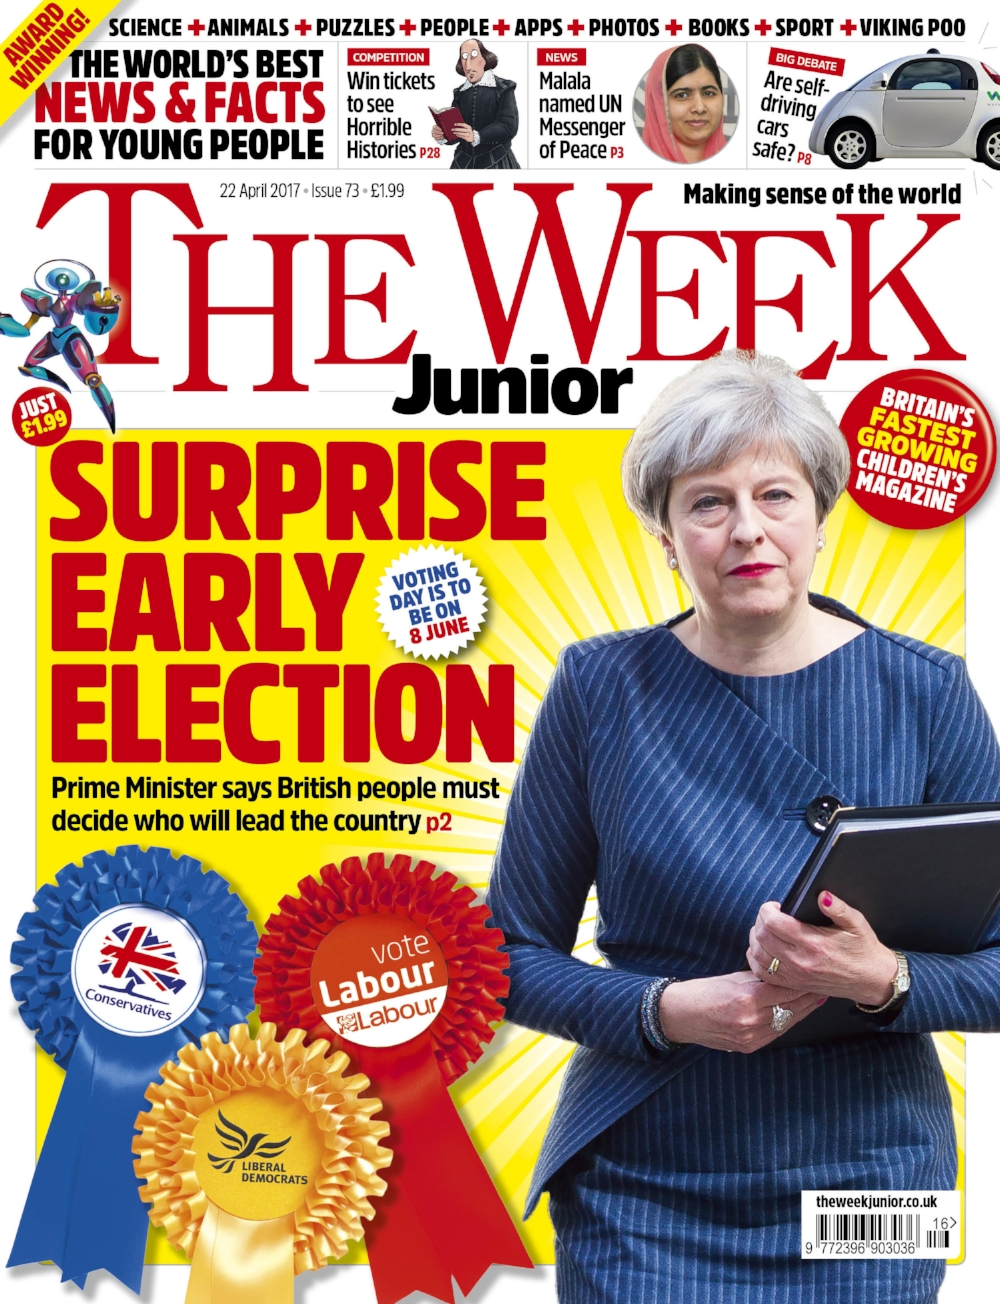 Week Front Cover.jpg